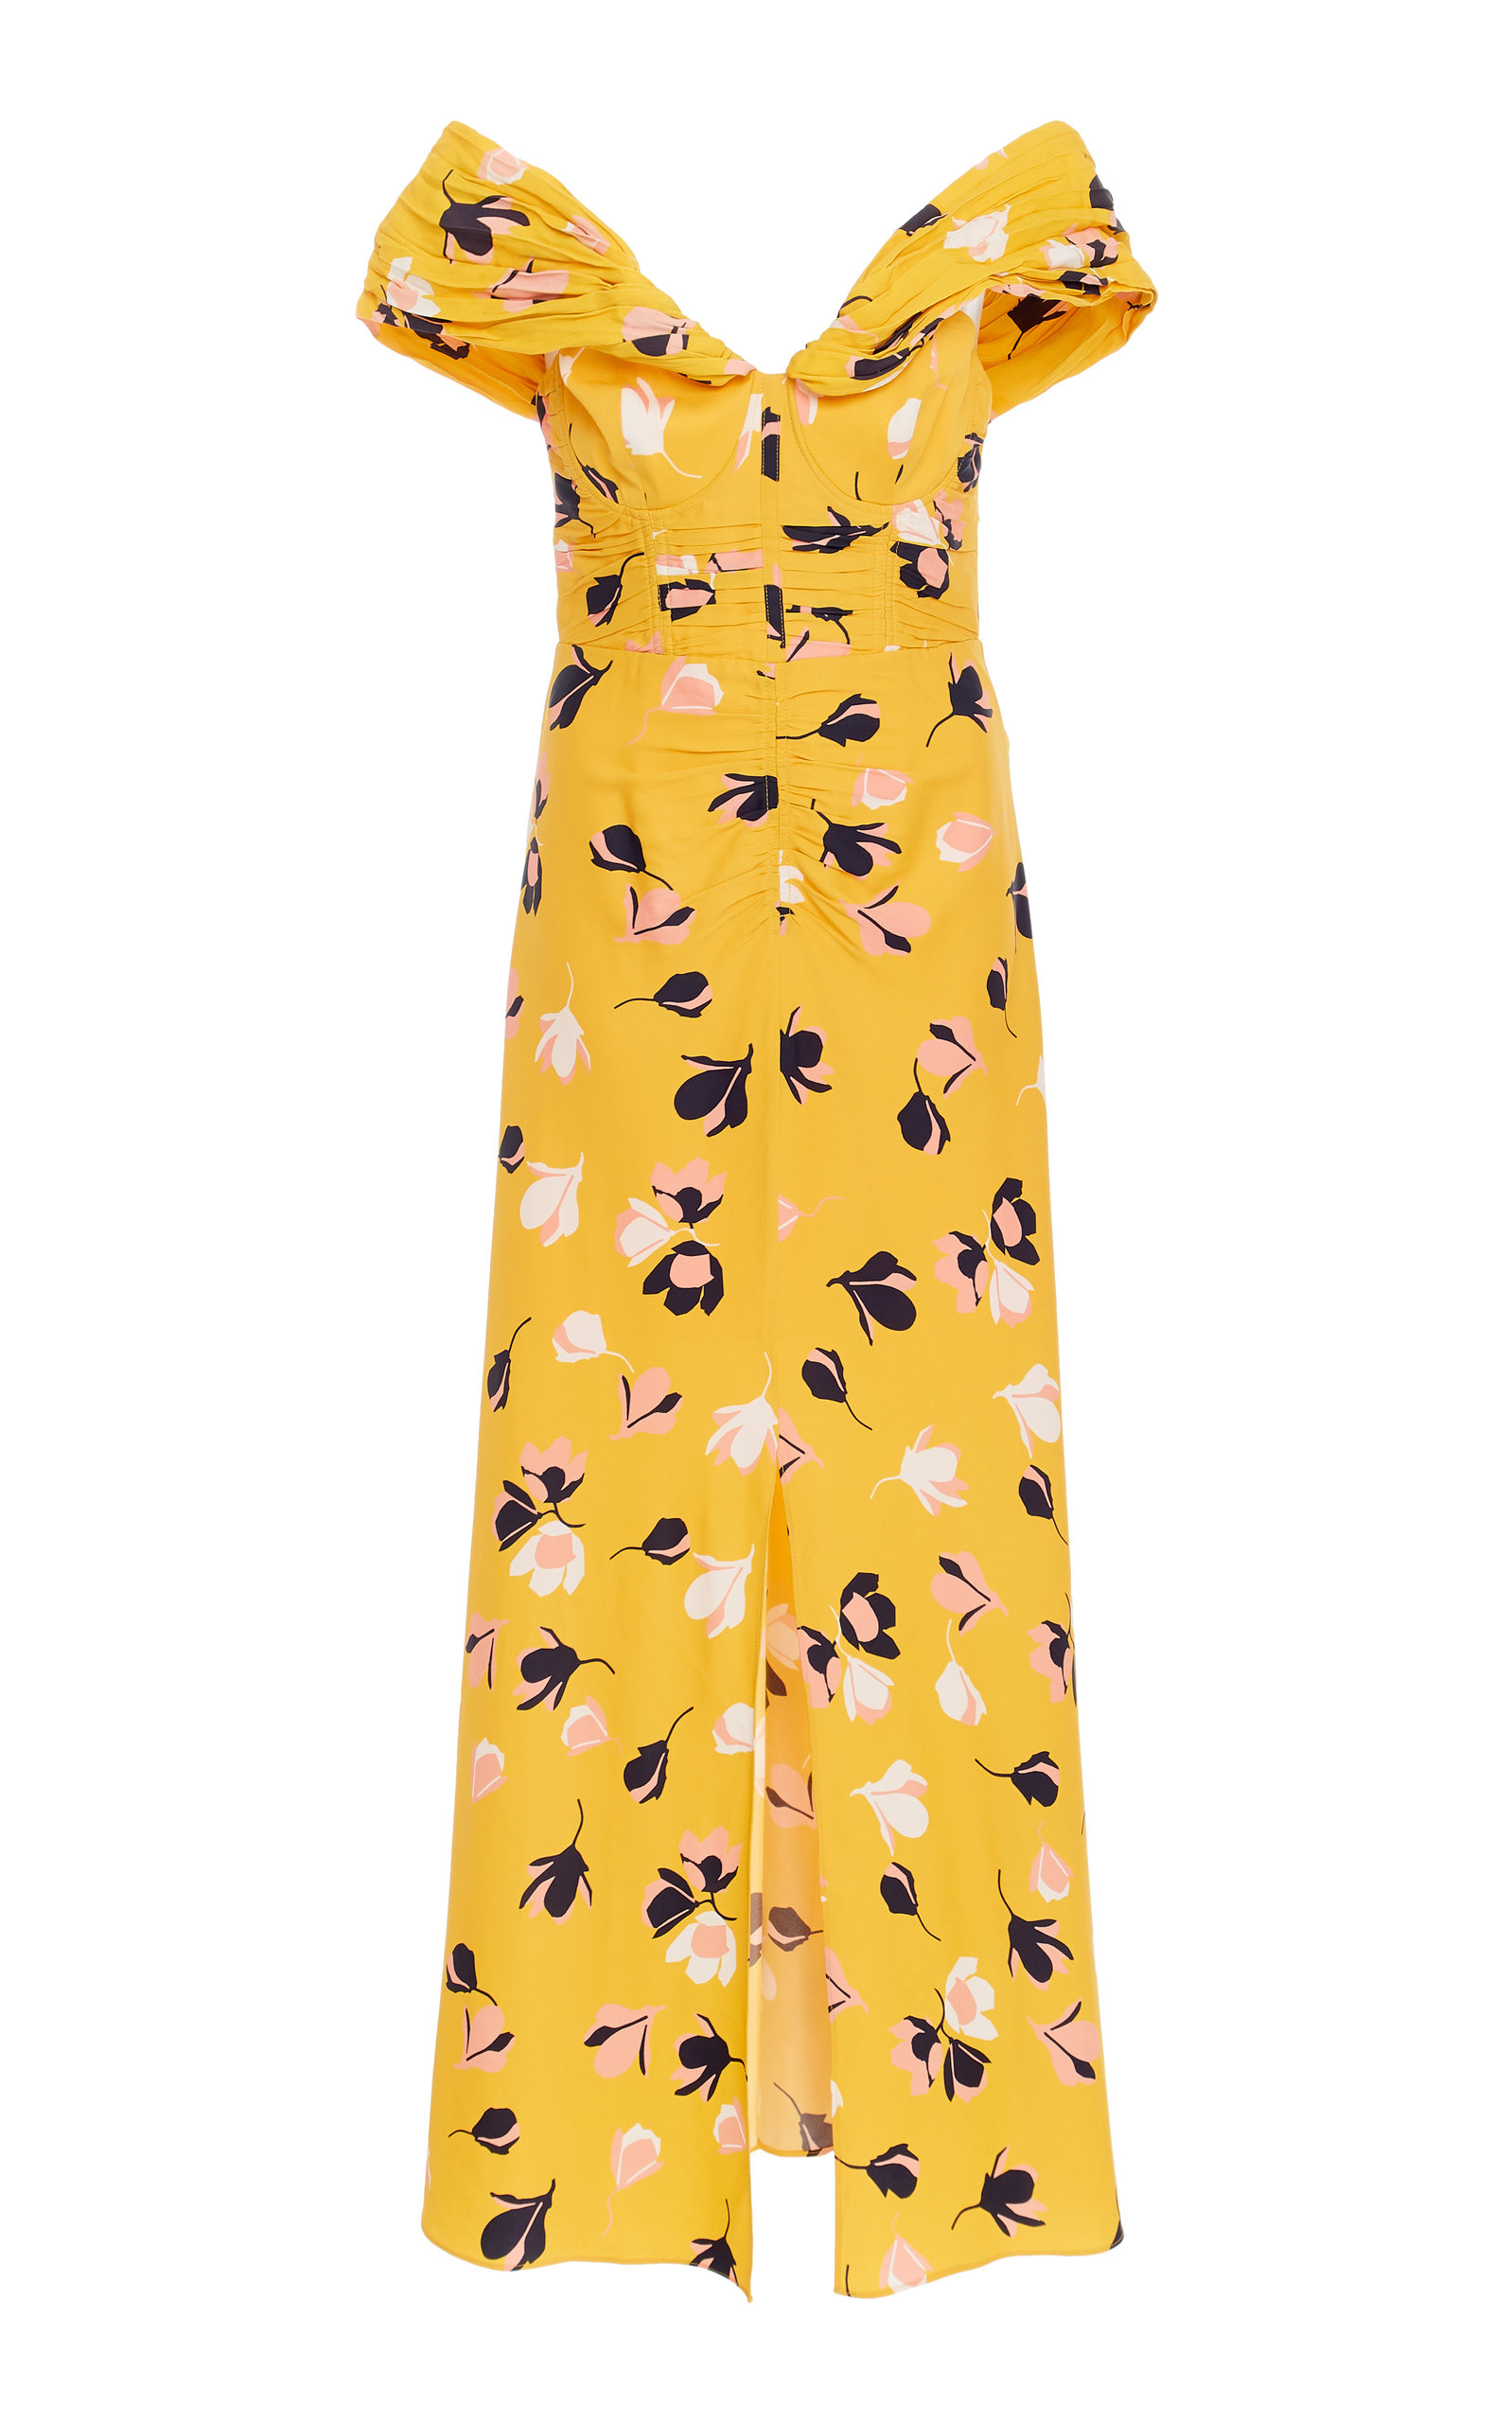 776ceffc114 Exclusive Floral-Print Jersey Midi Dress by Self Portrait